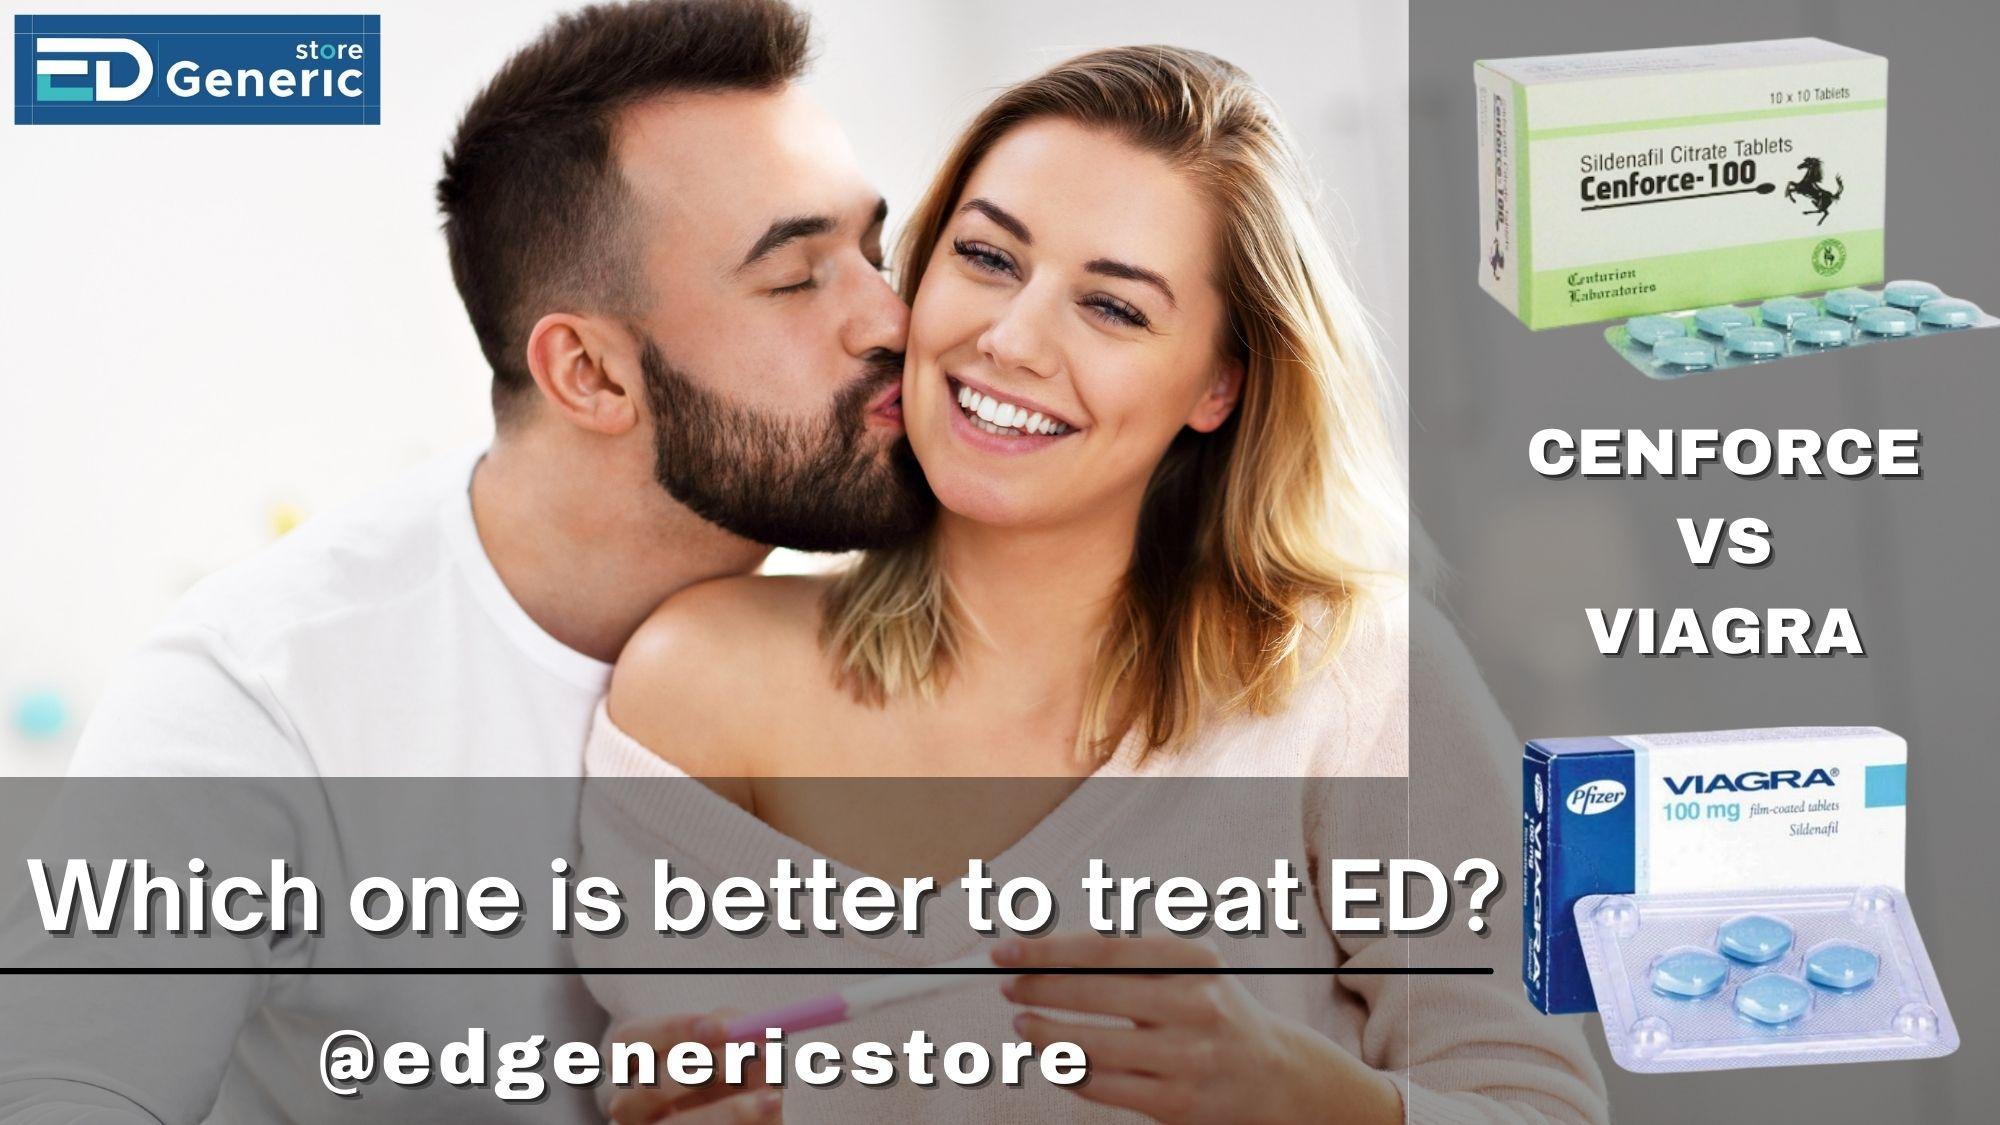 Cenforce vs Viagra - Ed generic store